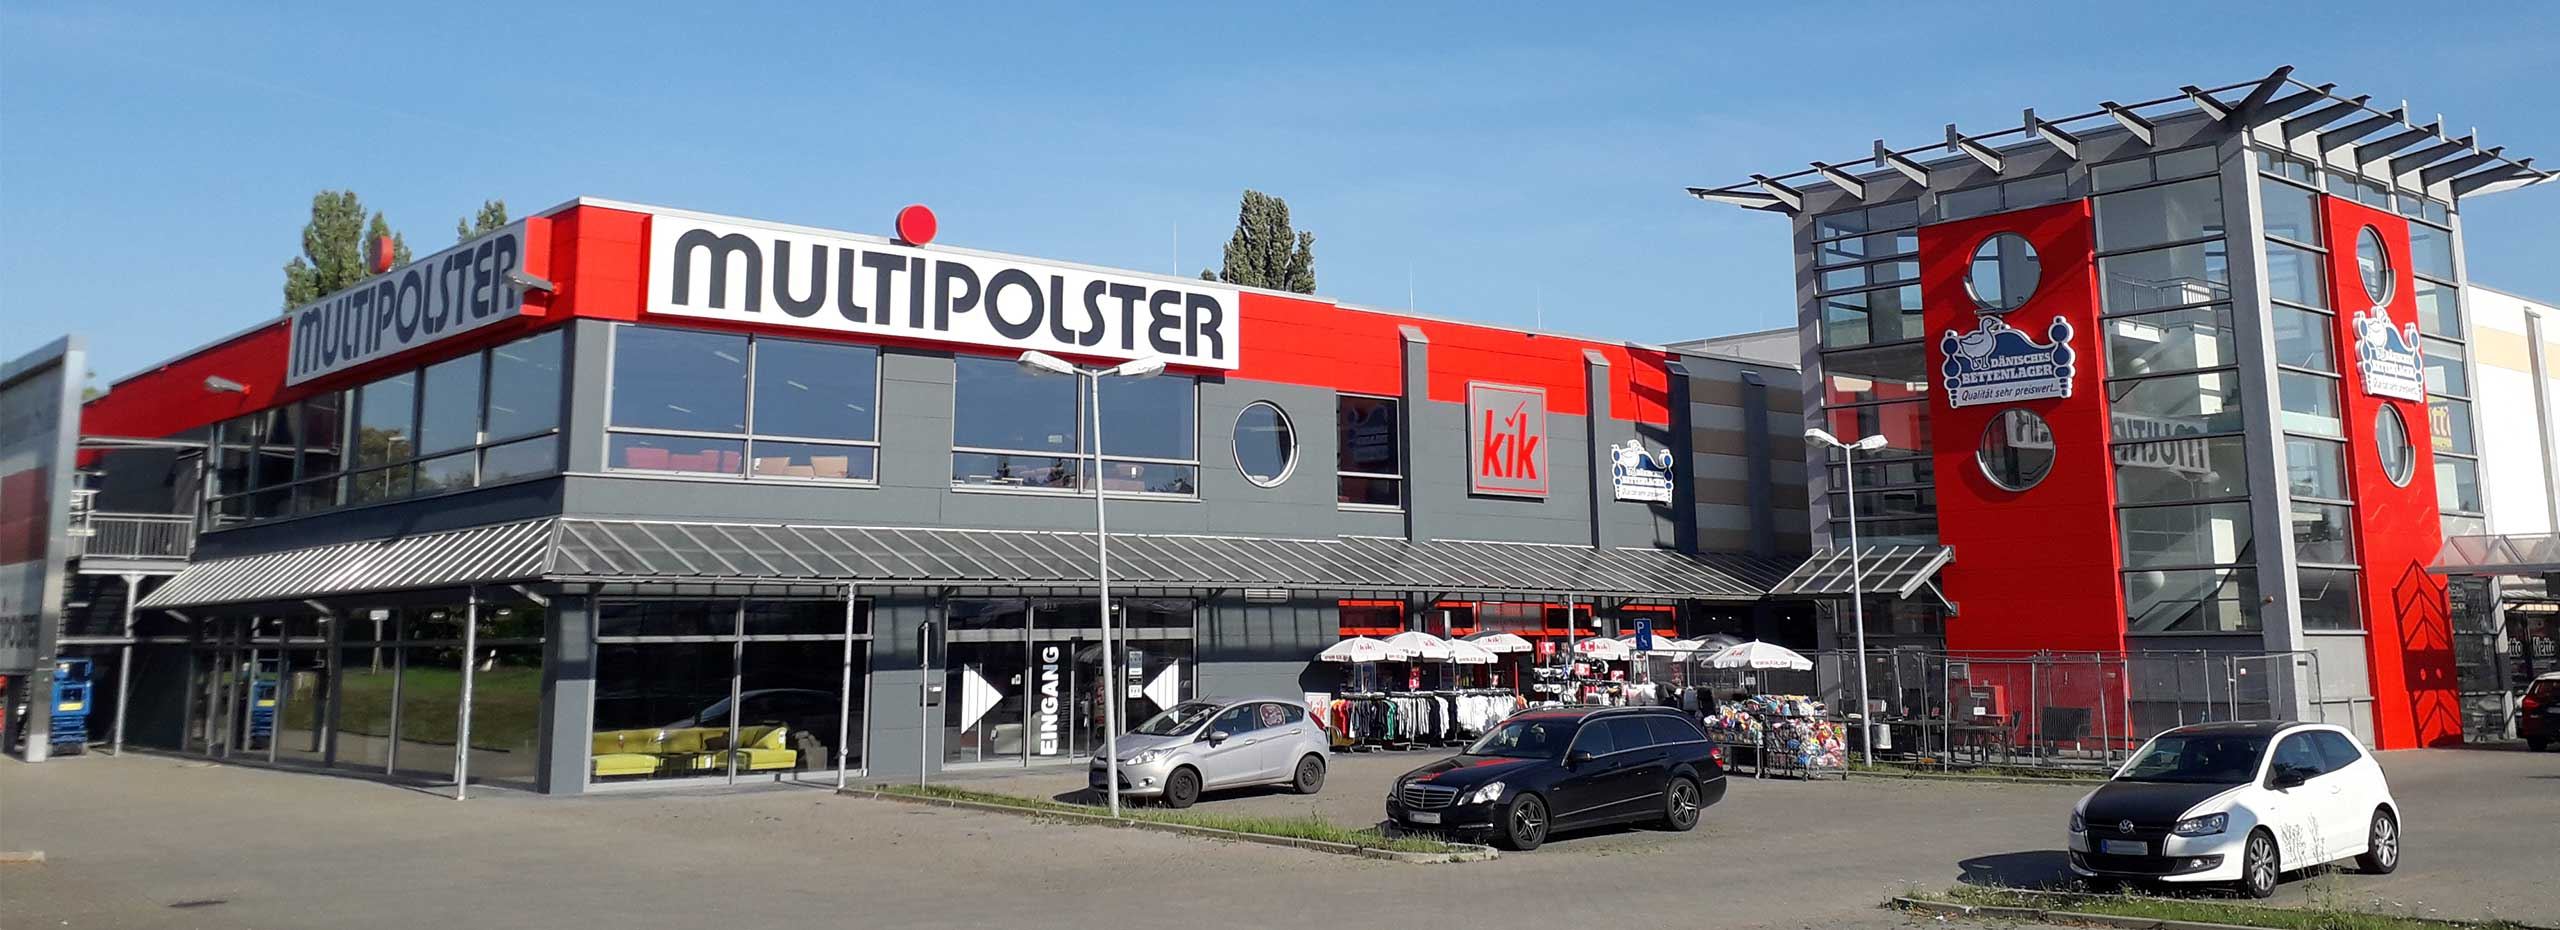 Multipolster - Magdeburg am Bördepark